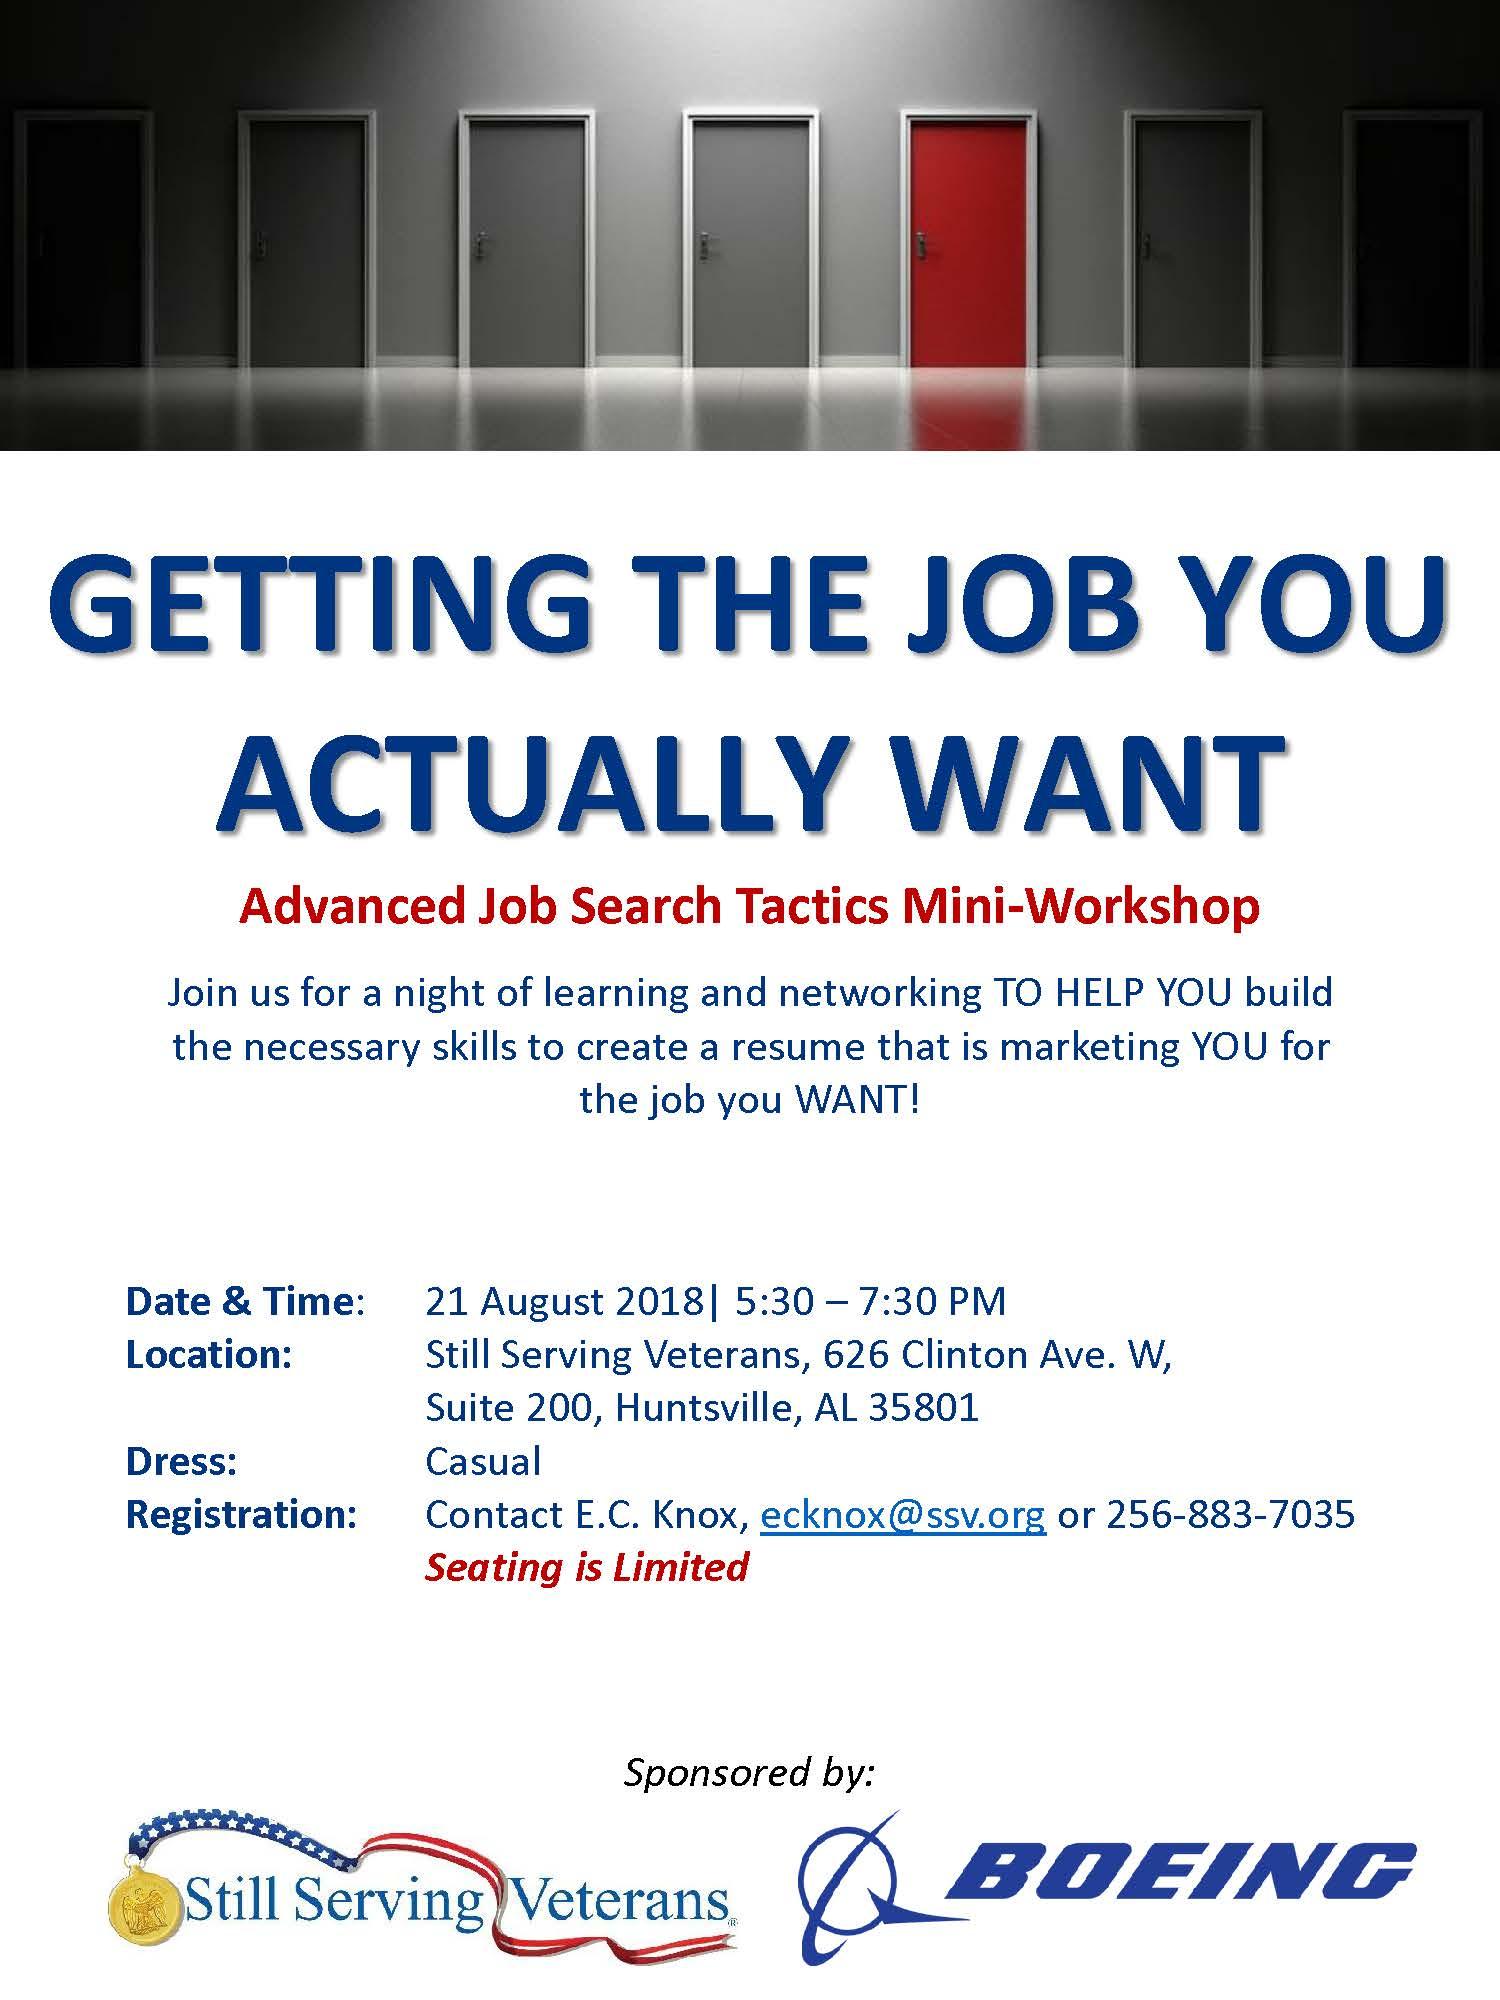 Flyer-Advanced Job Search Tactics Mini-Workshop_21AUG2018.jpg